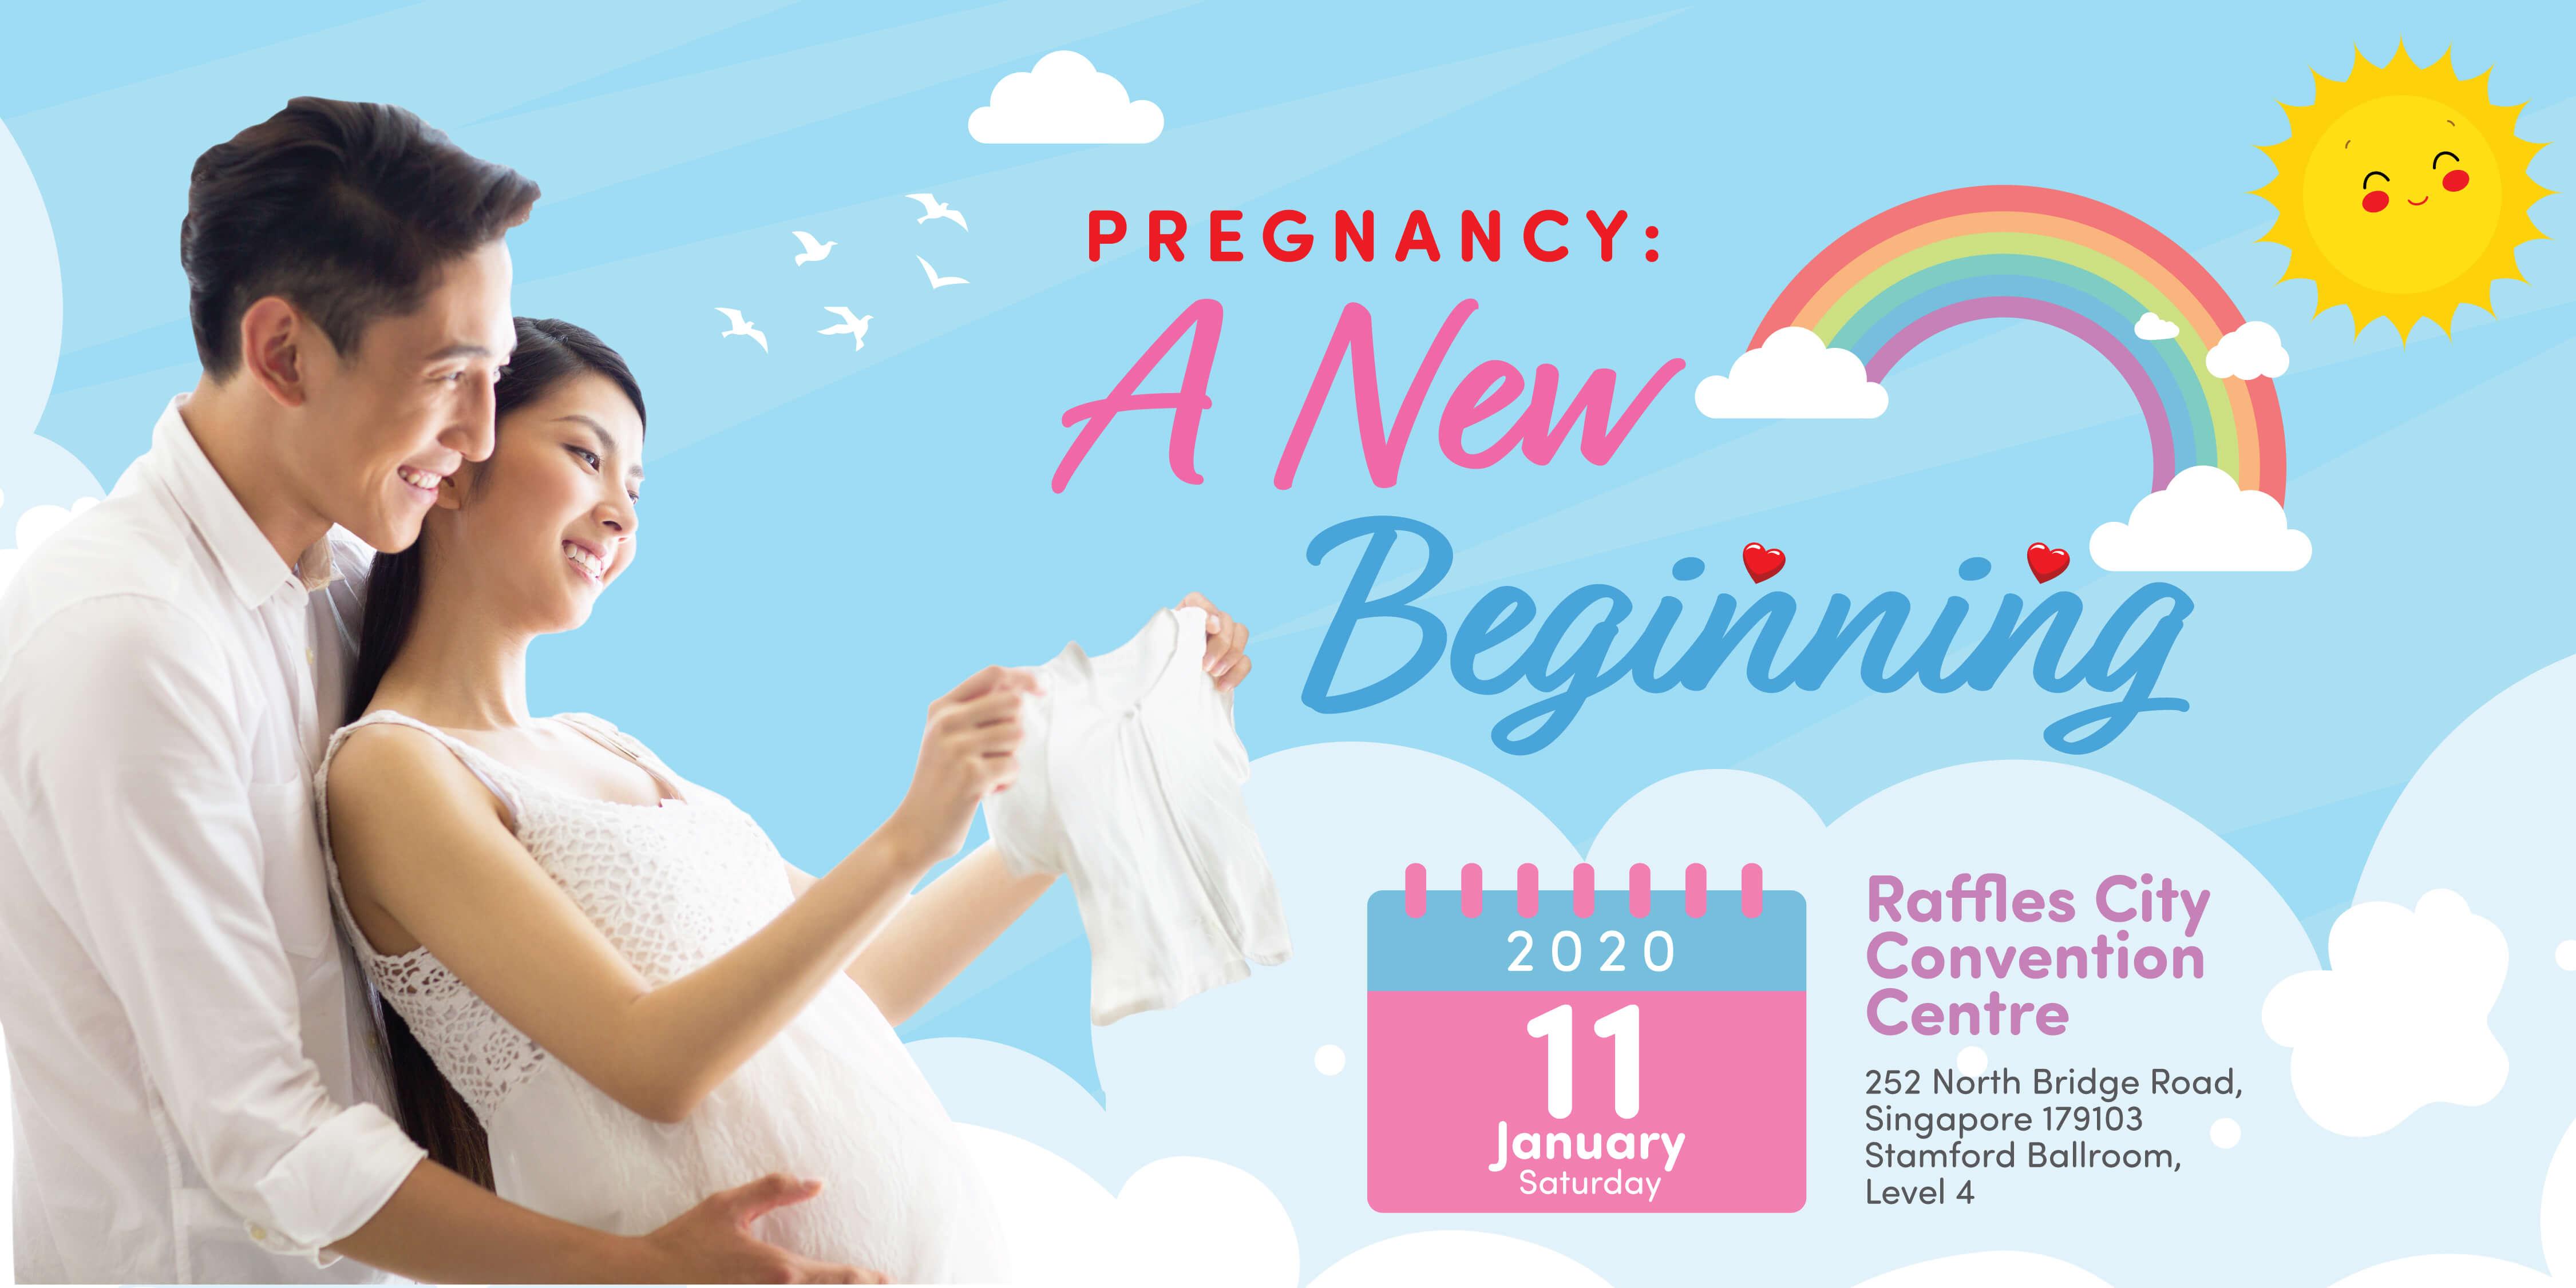 Pregnancy: A New Beginning - Jan 2020